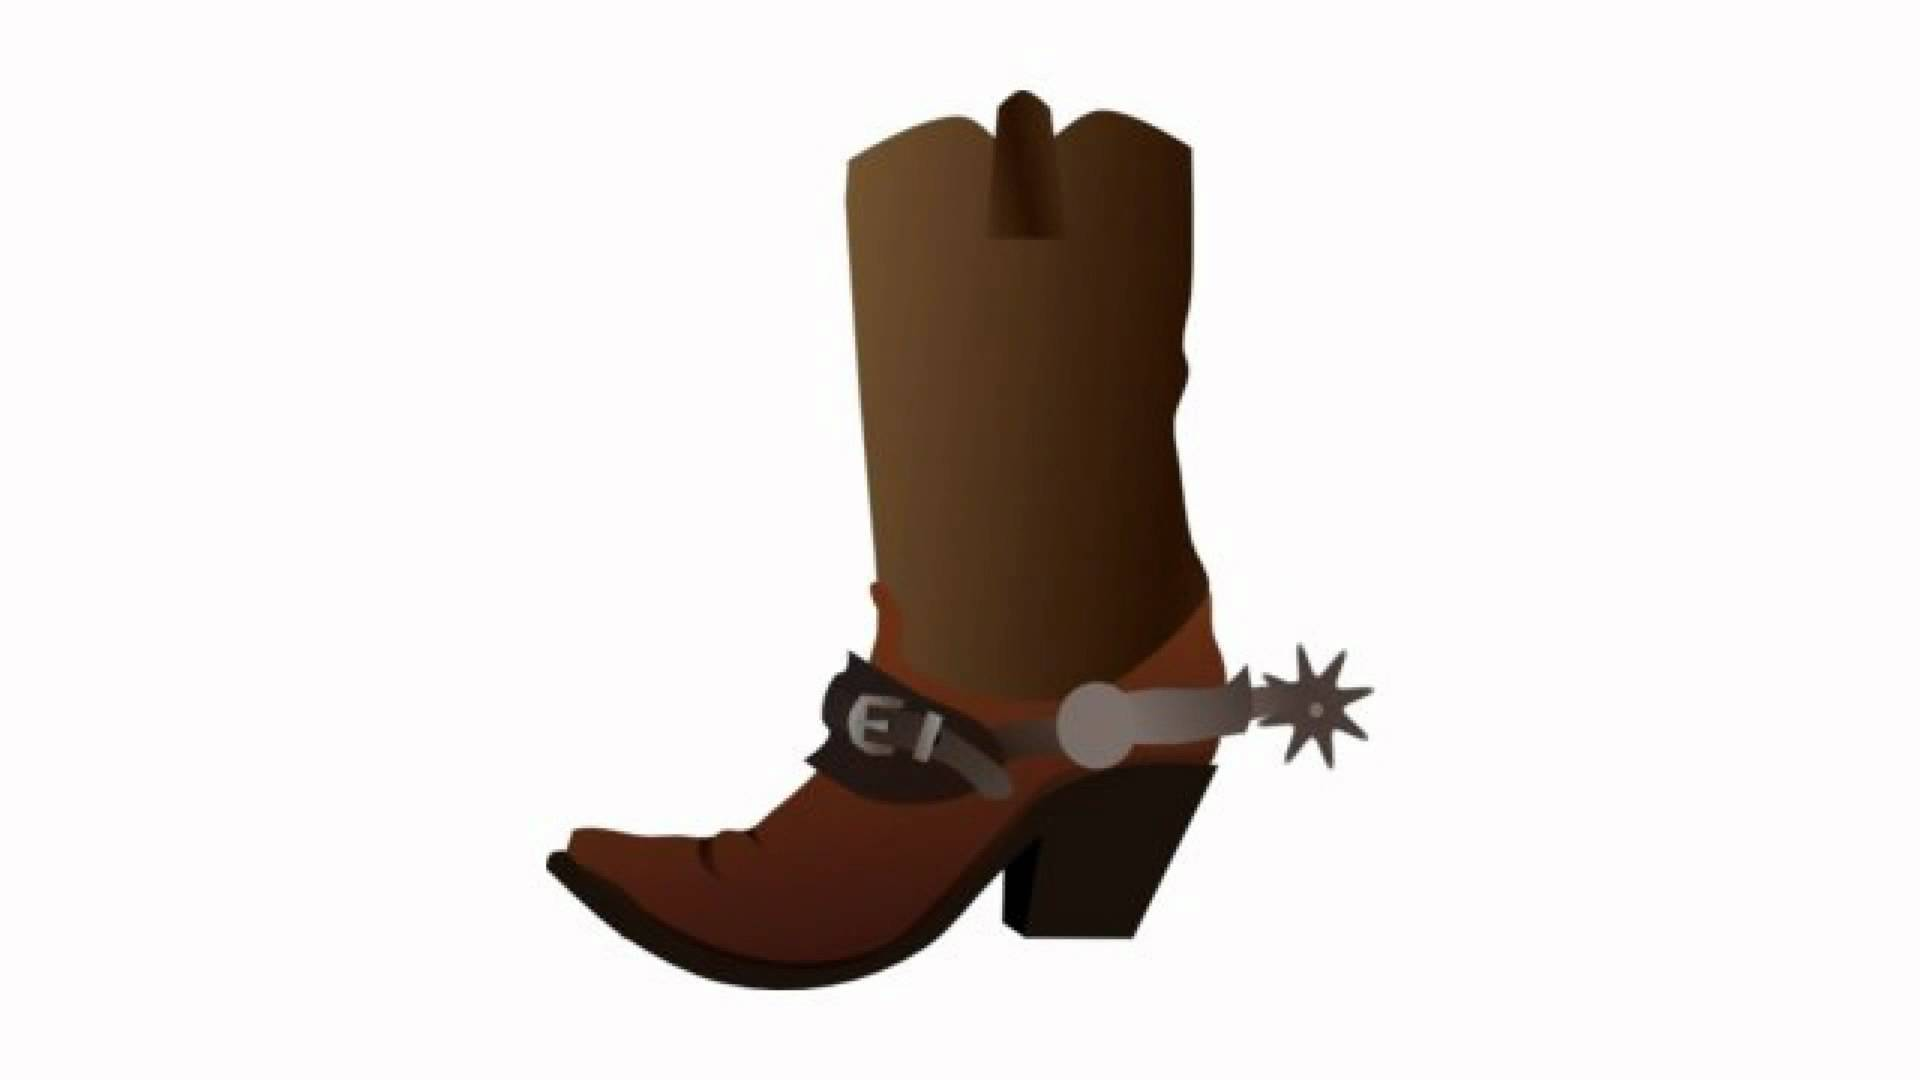 Cowboy boot clip art cowboy boots and hat wall art honey pinion.